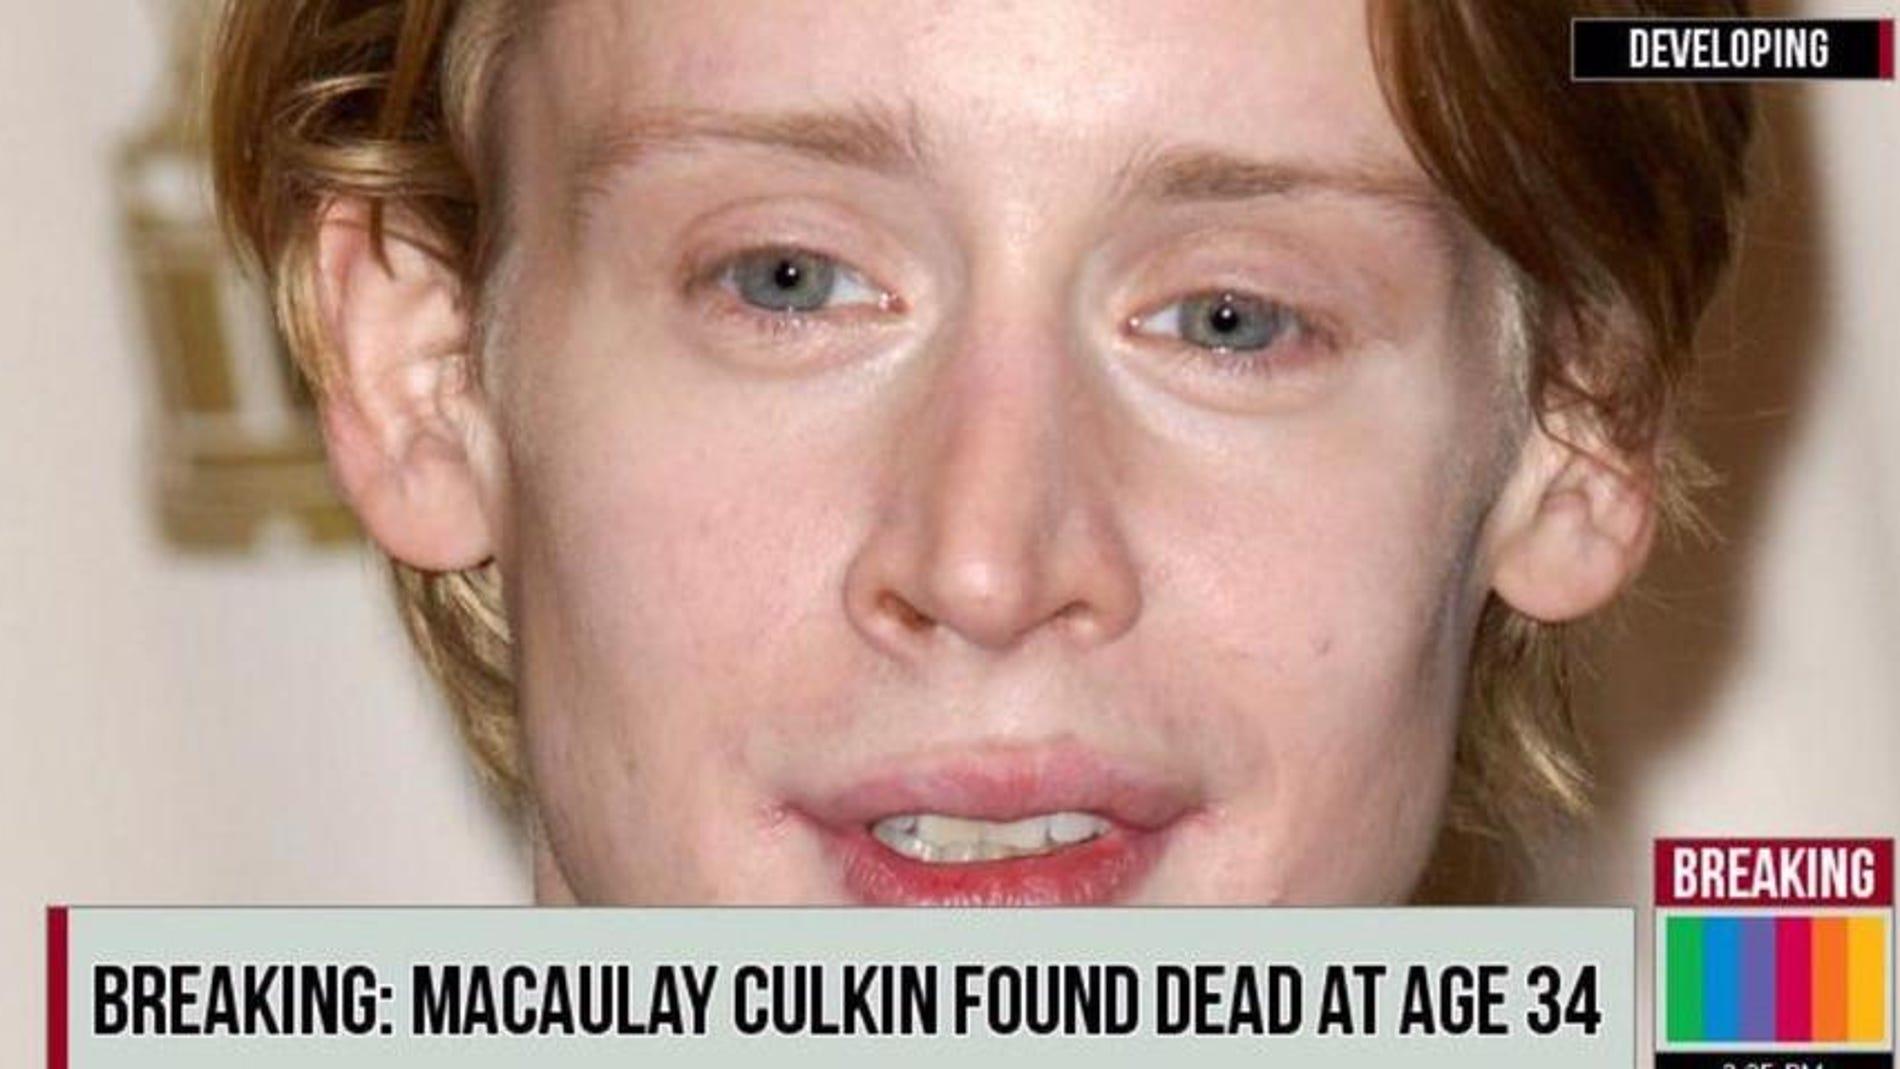 Noticia falsa sobre Macaulay Culkin